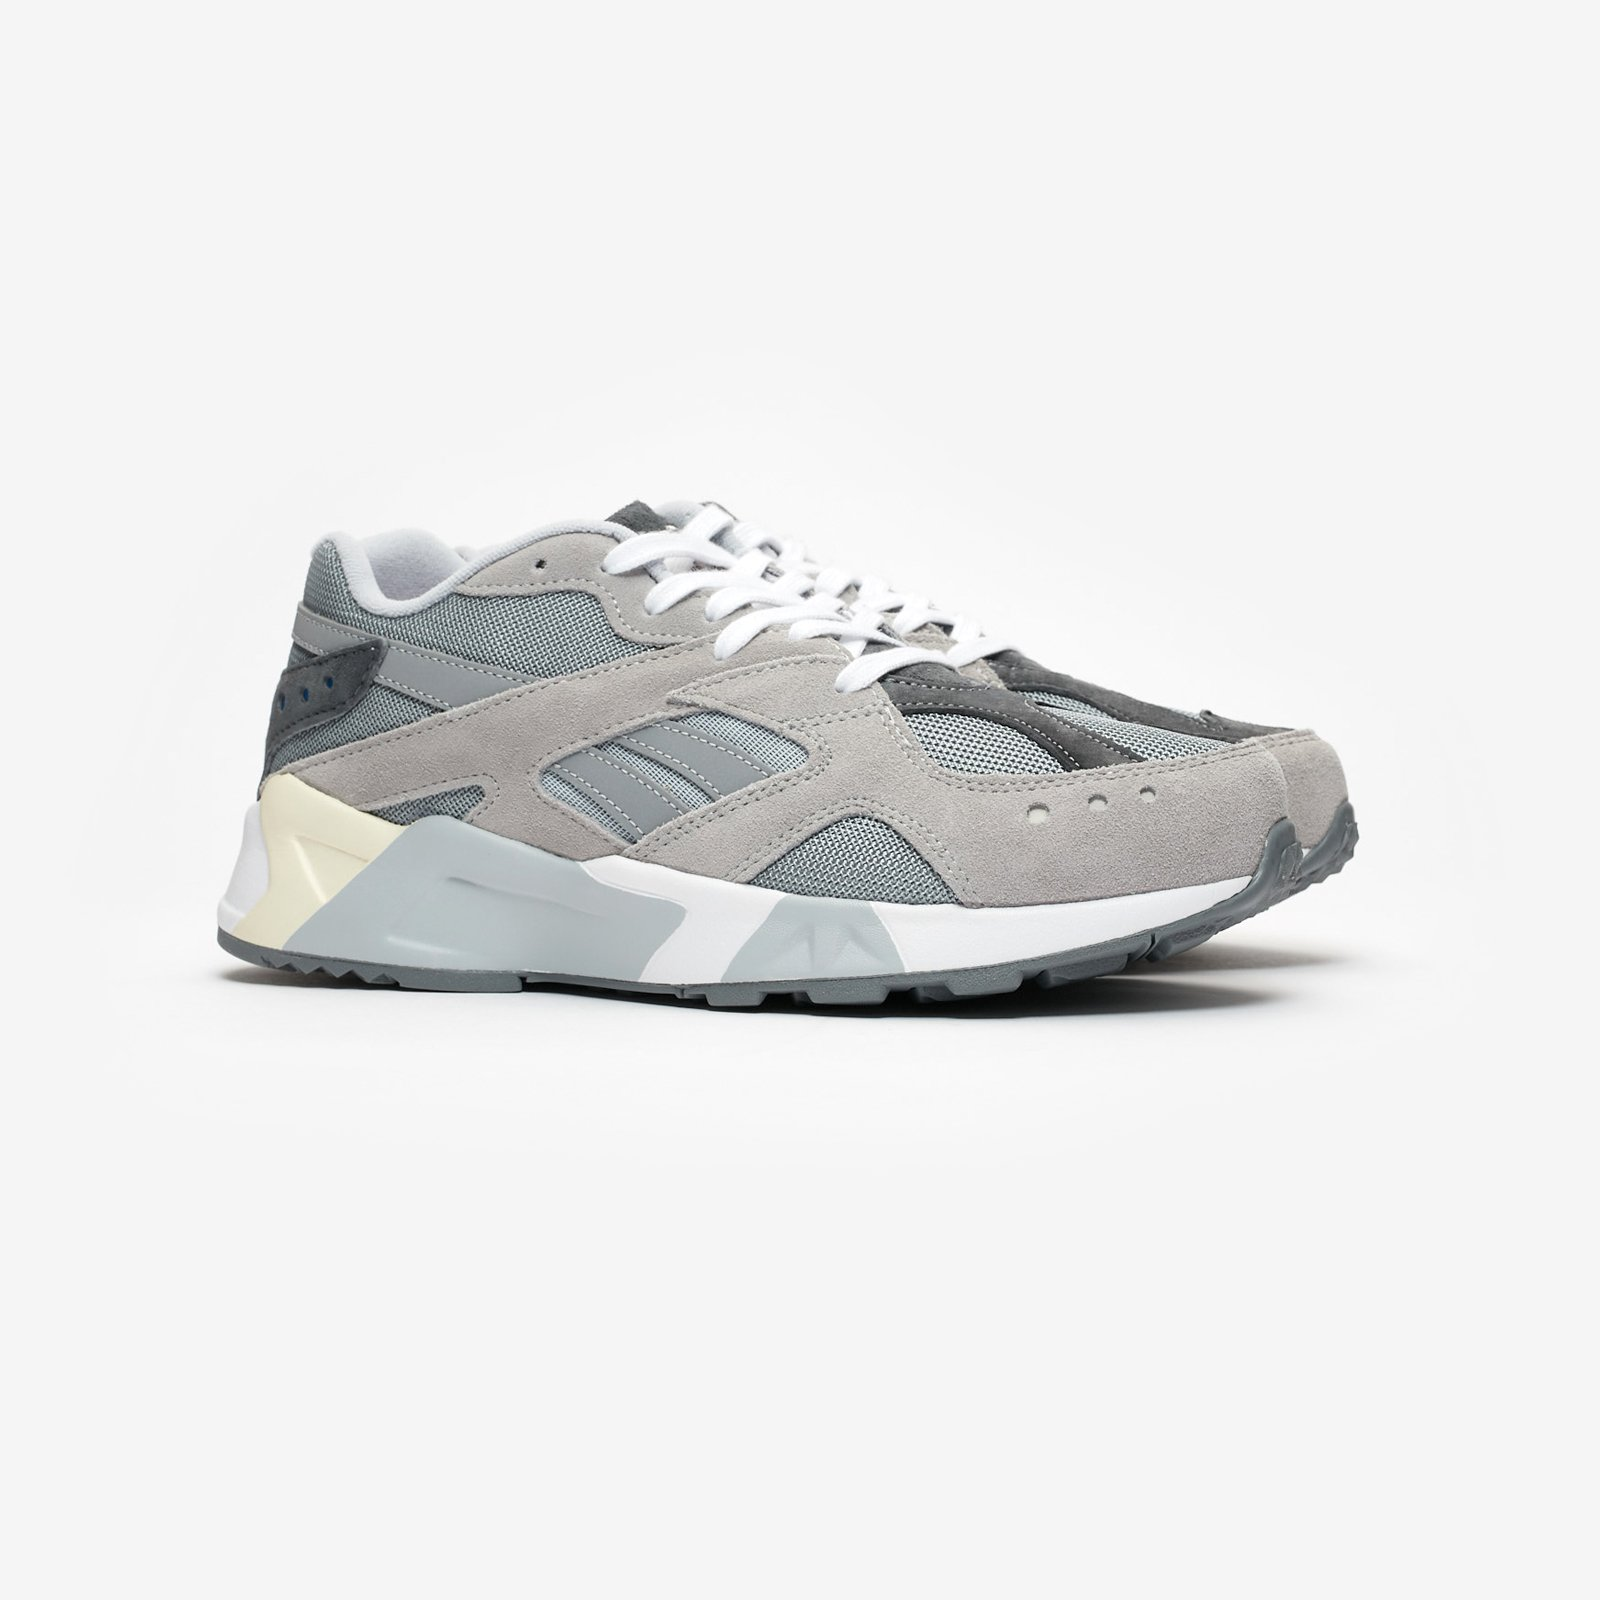 Reebok Aztrek x Packer Dv9835 Sneakersnstuff I Sneakers